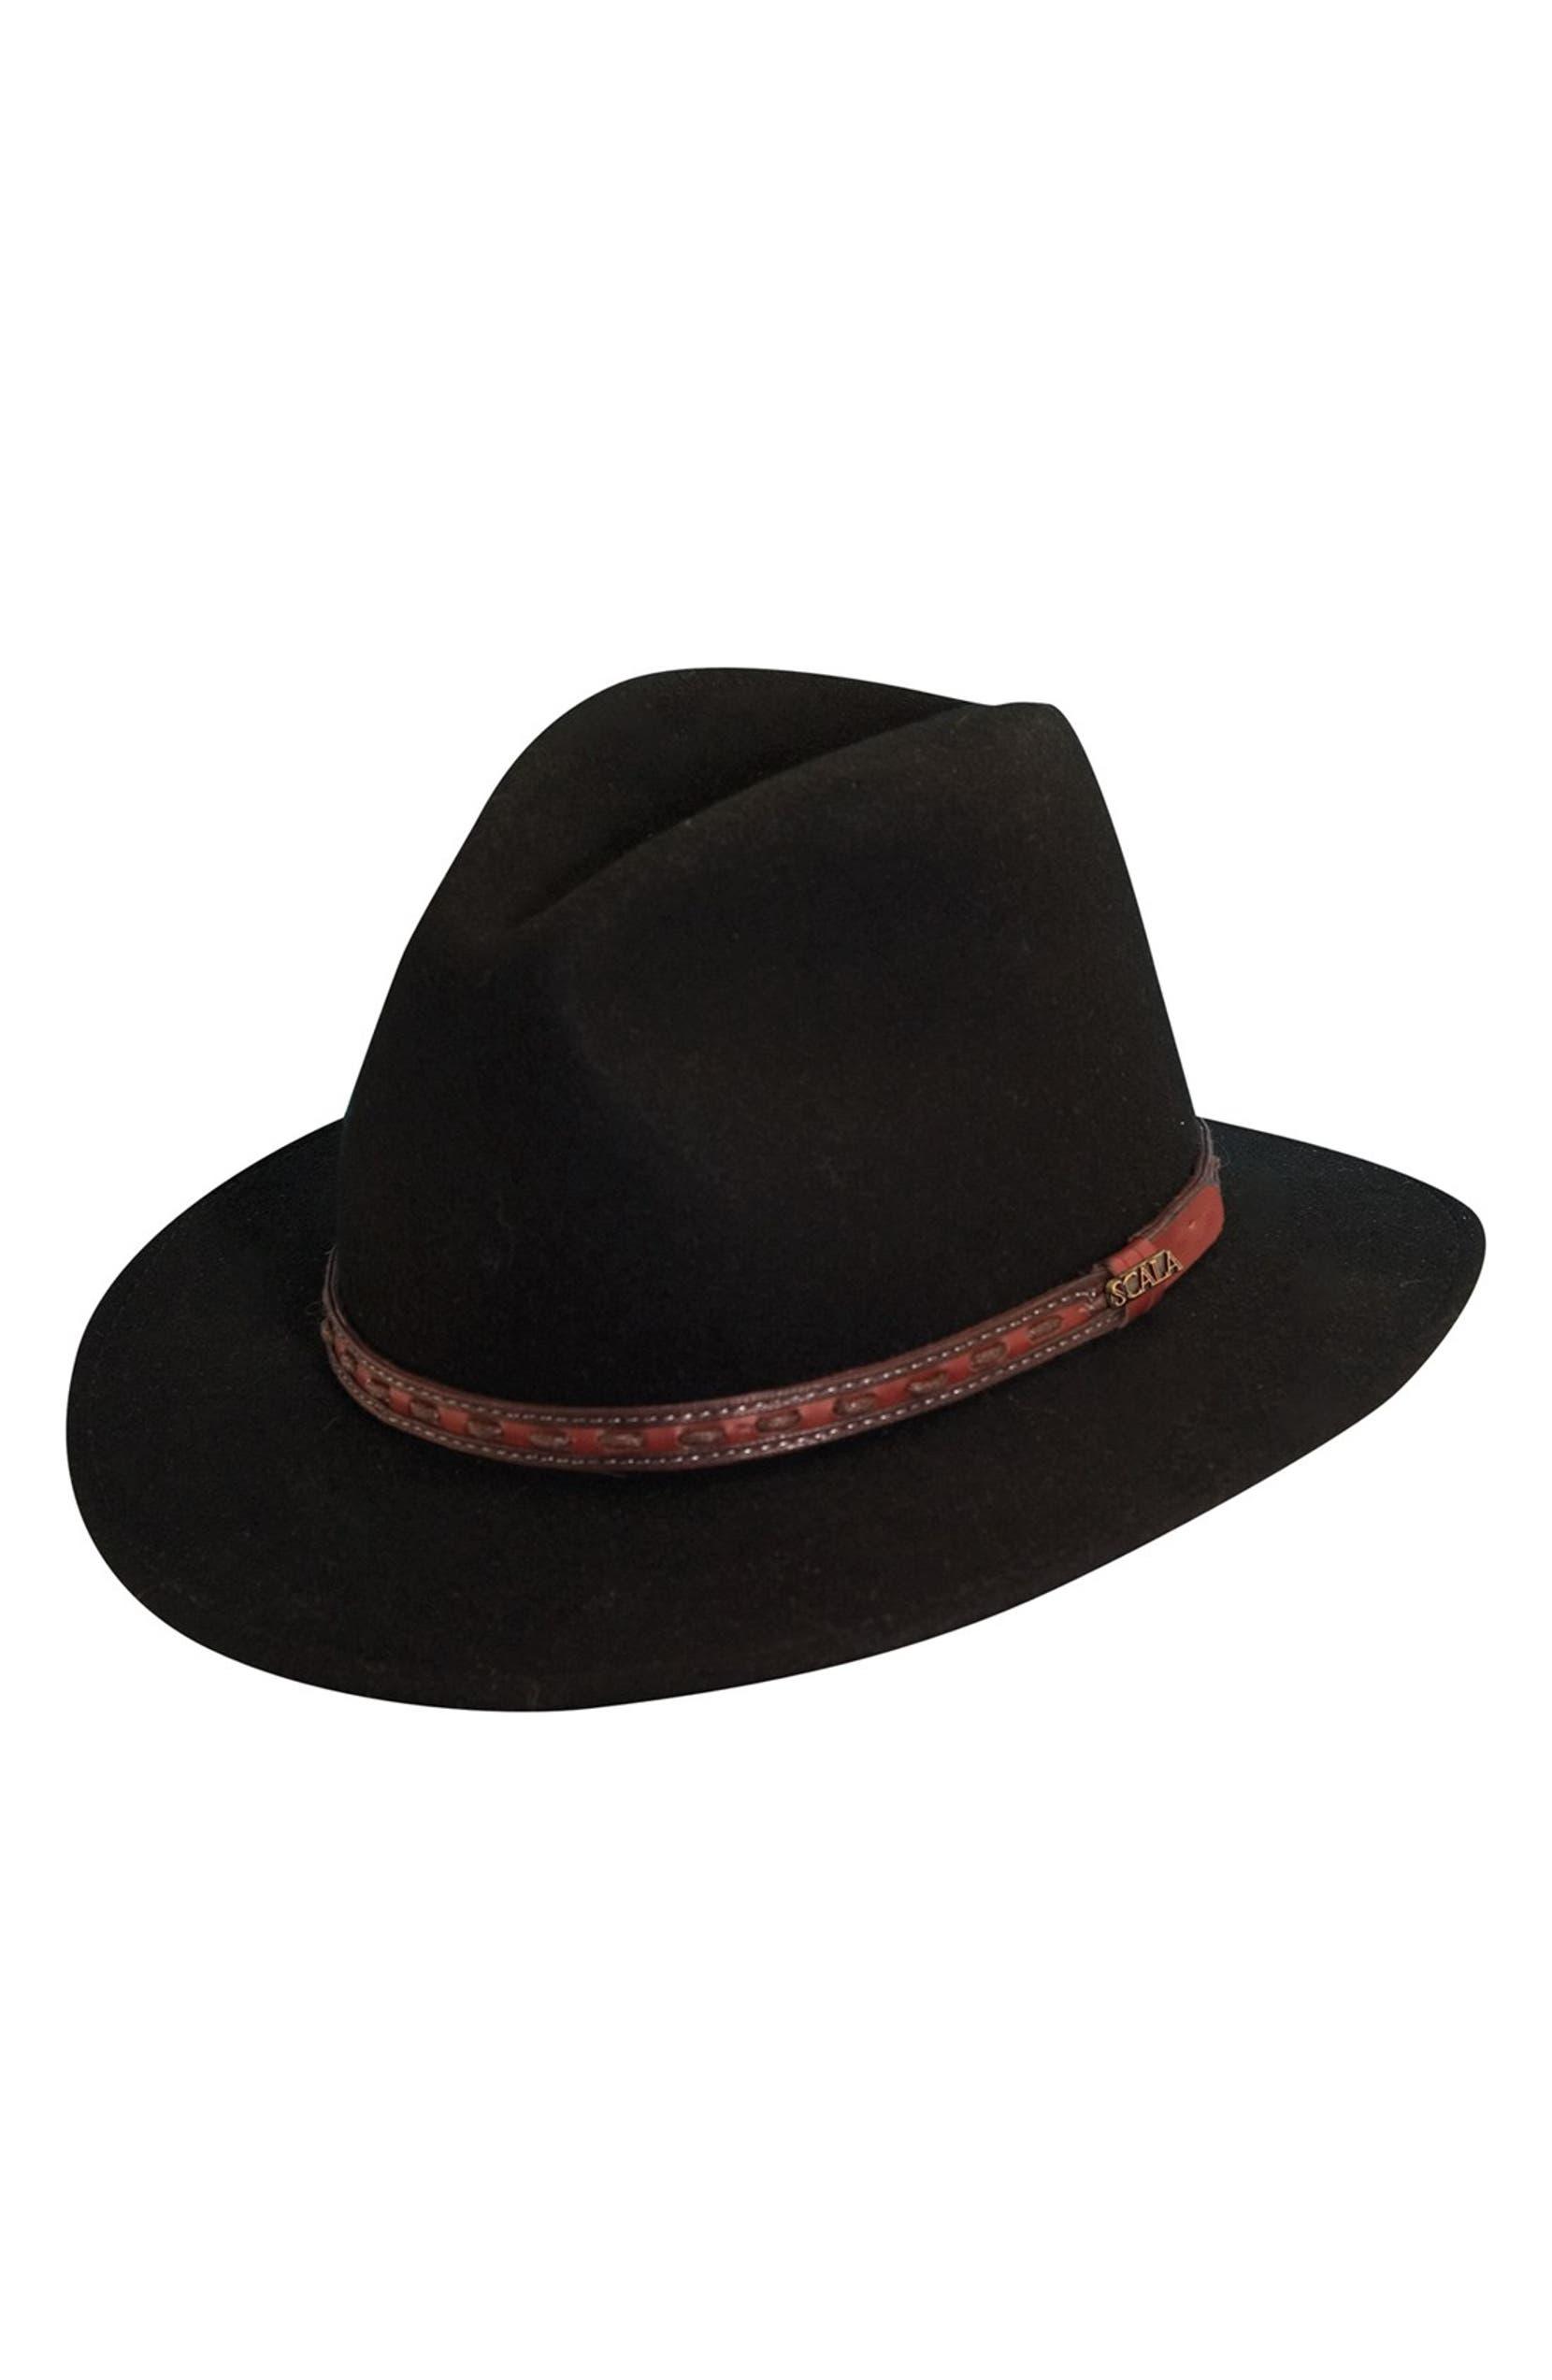 Scala  Classico  Crushable Felt Safari Hat  ba835d5afd34